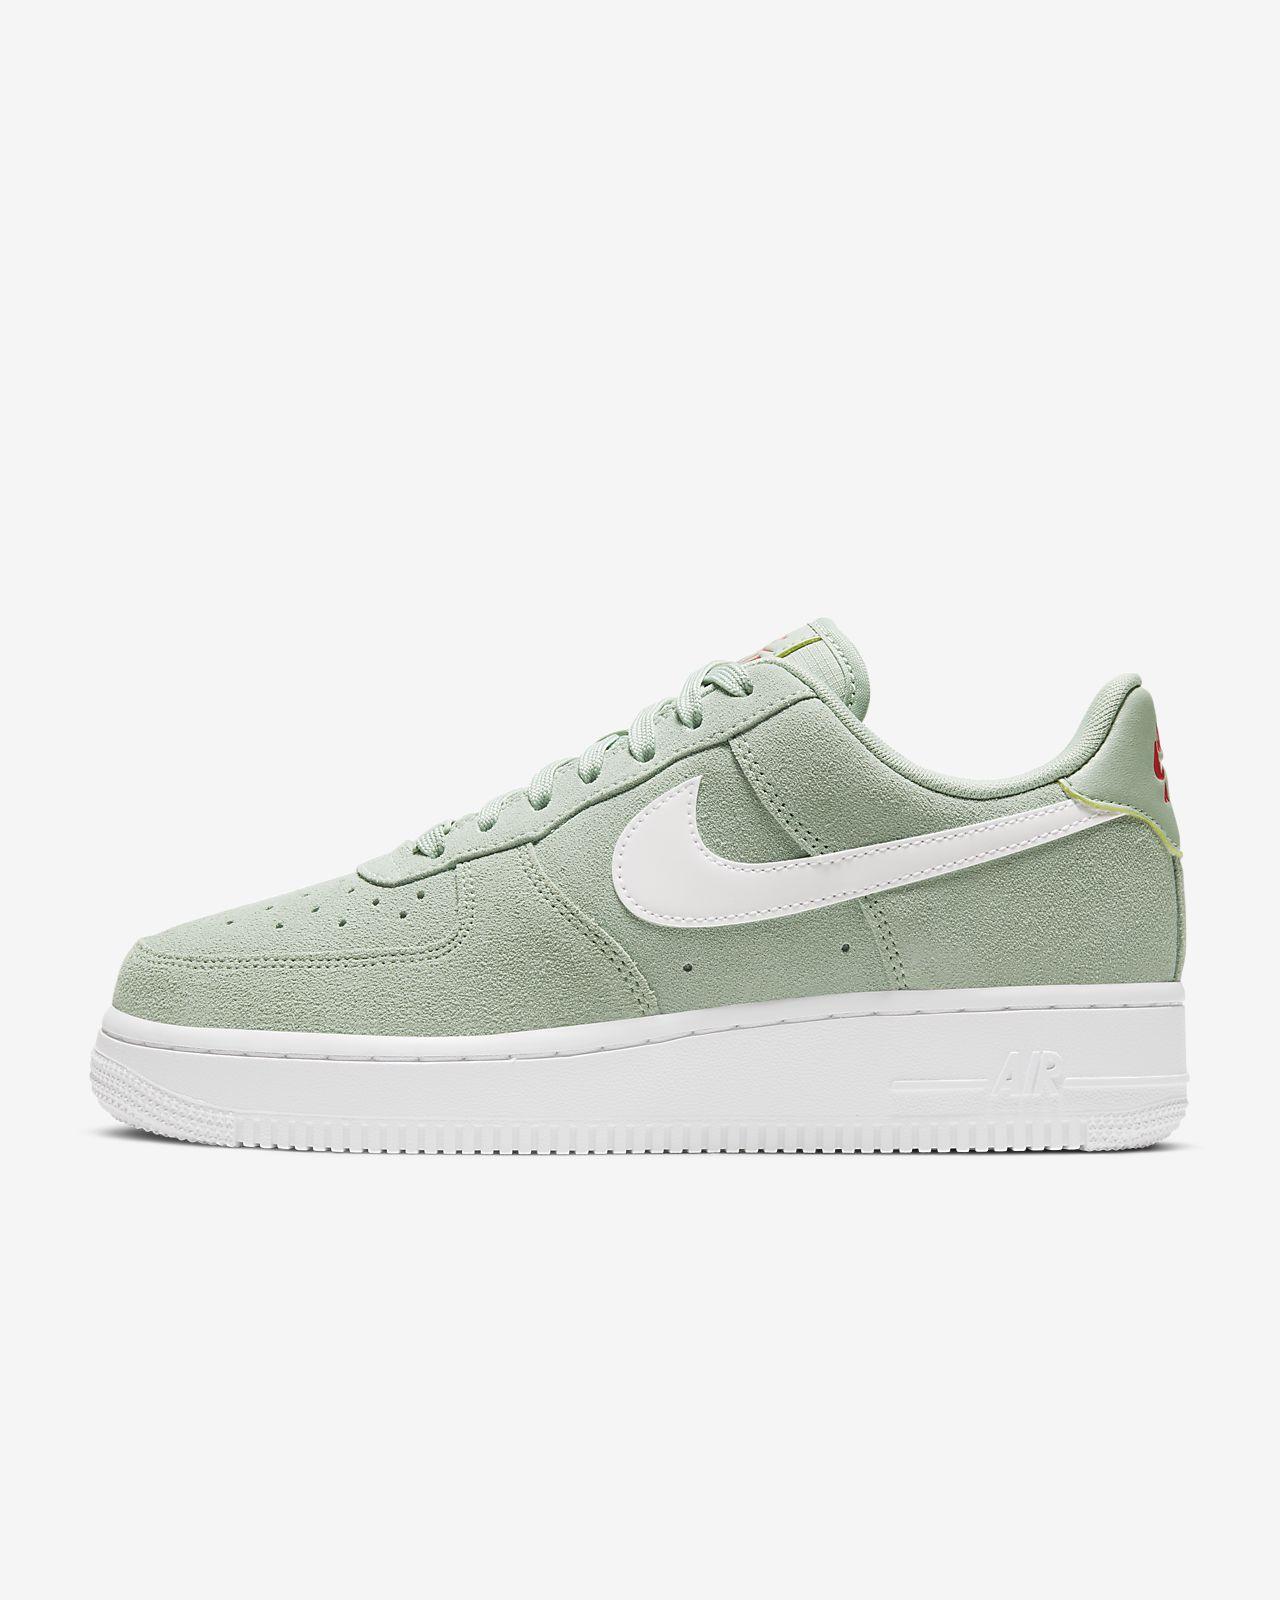 Nike | Treningstøy og sko dame | Getinspired.no | GetInspired.no